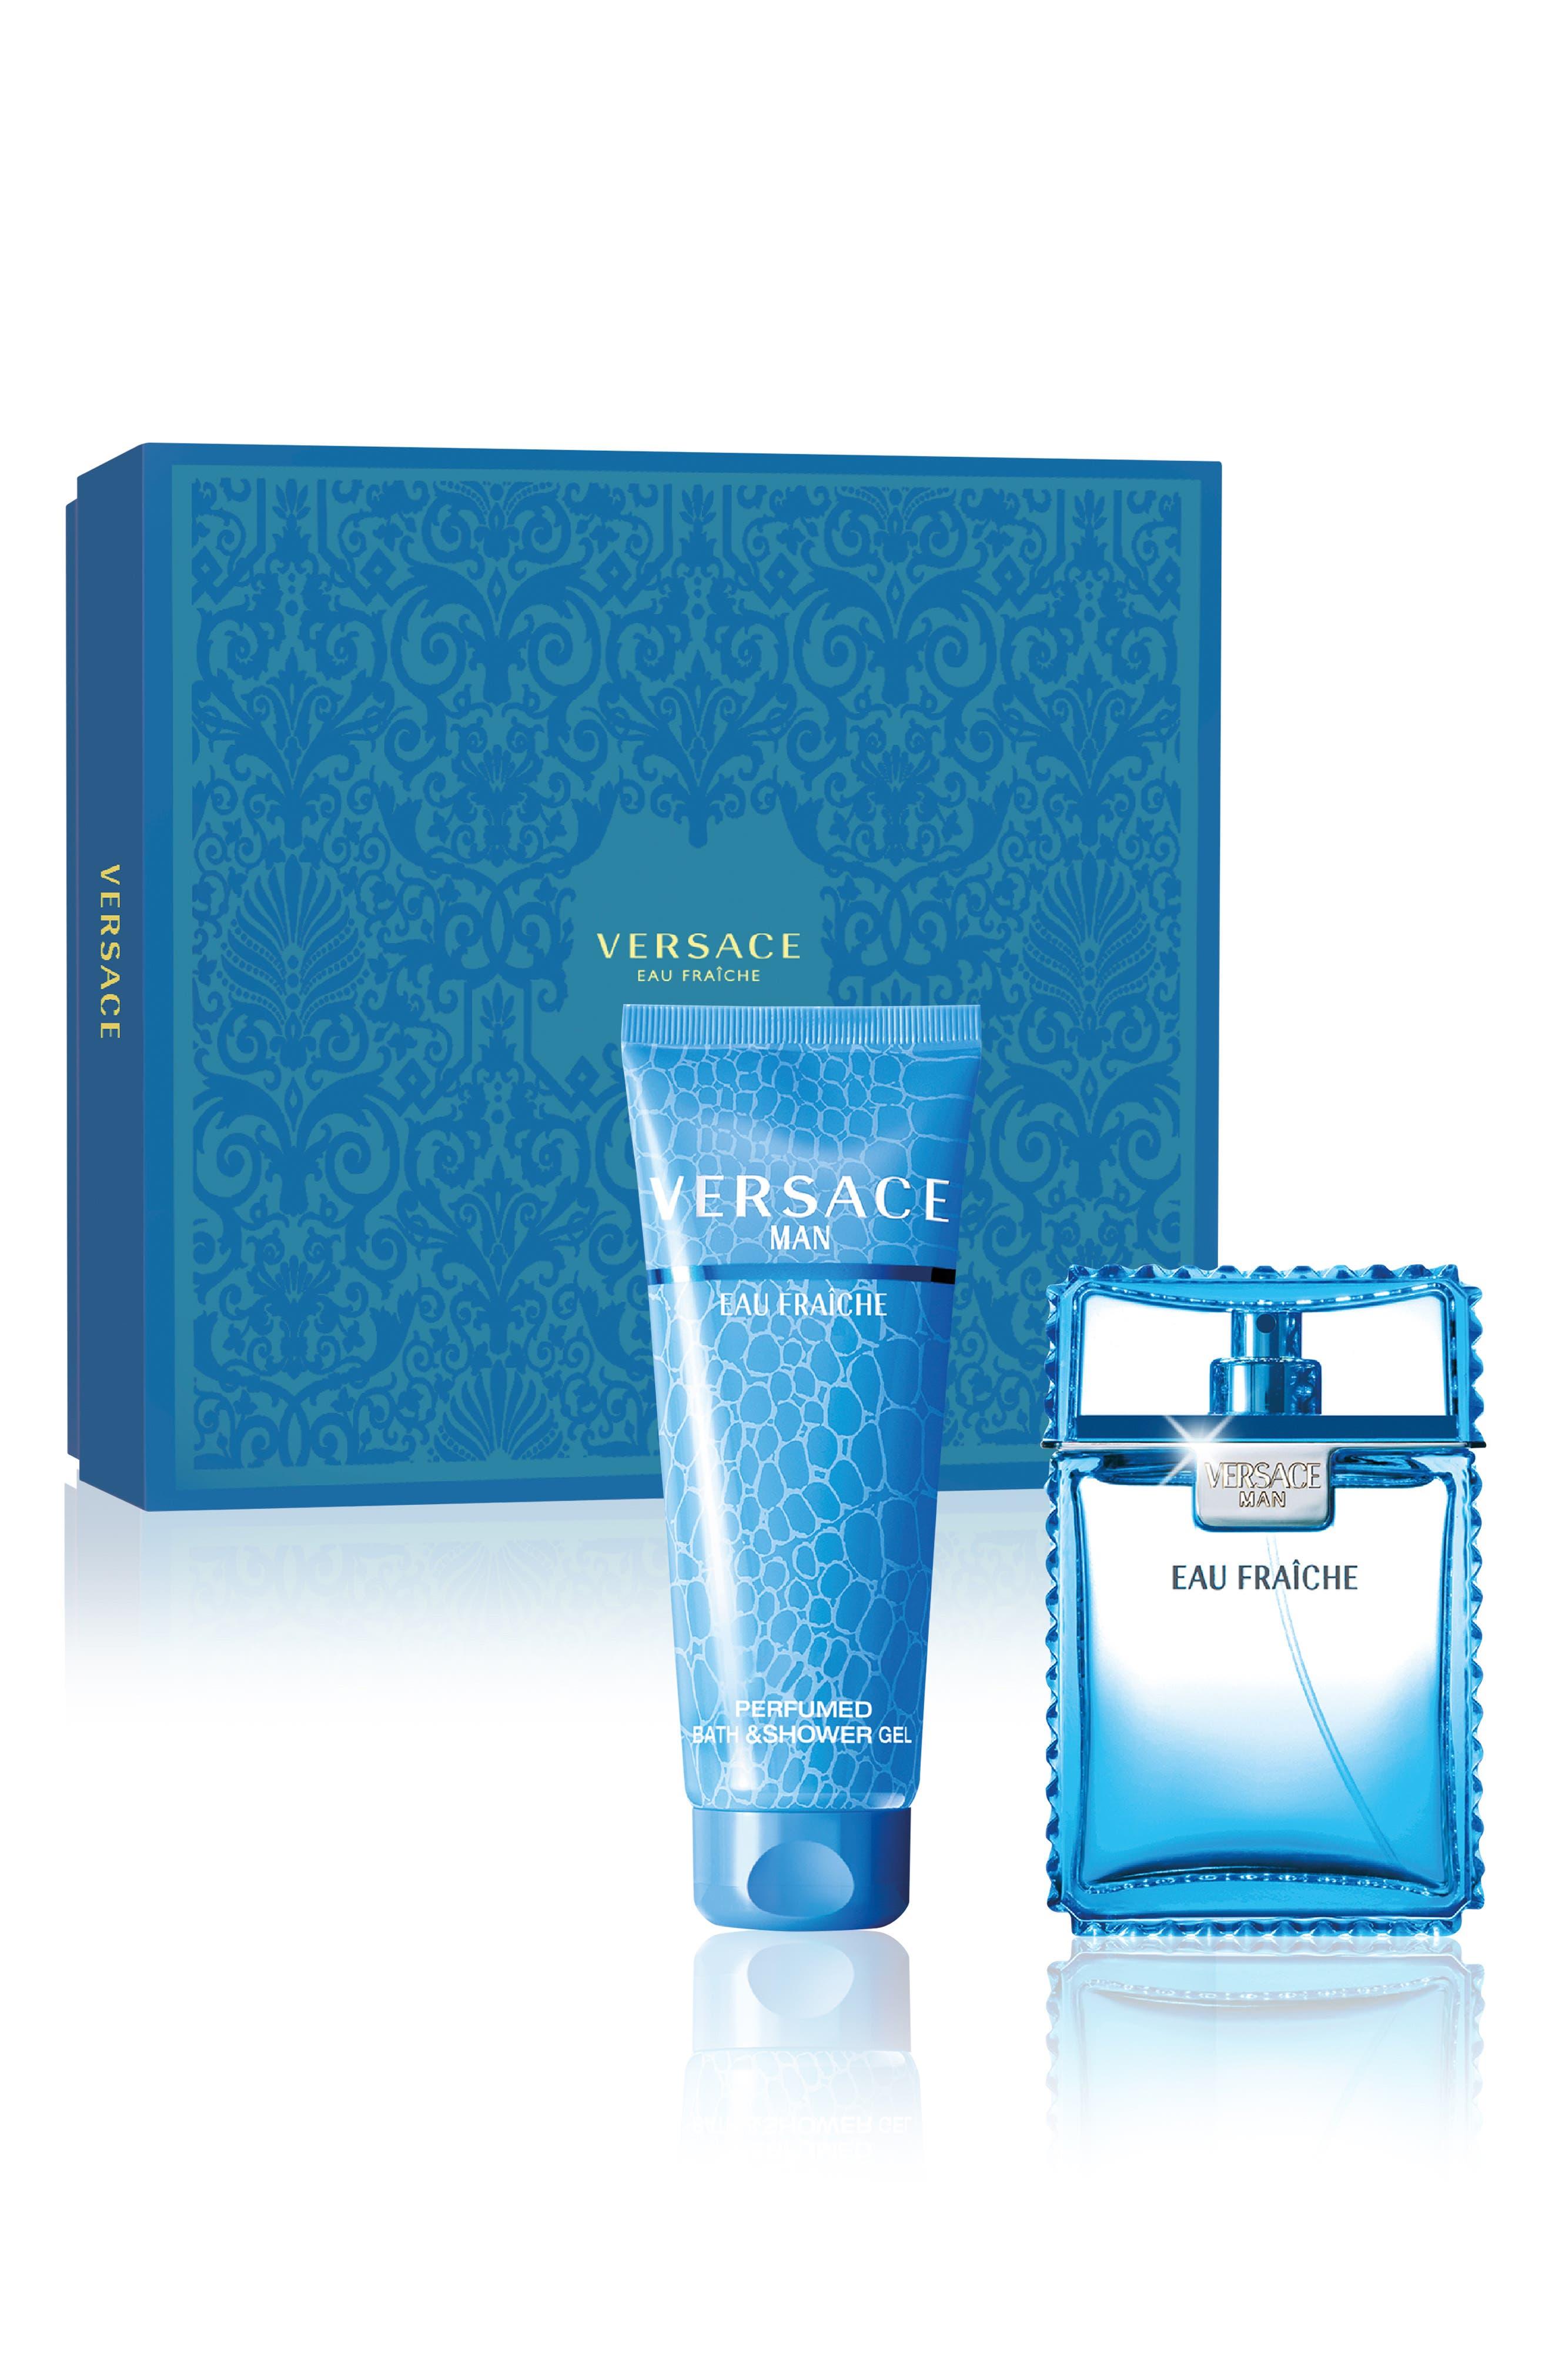 Versace Man Eau Fraiche Set ($104 Value)